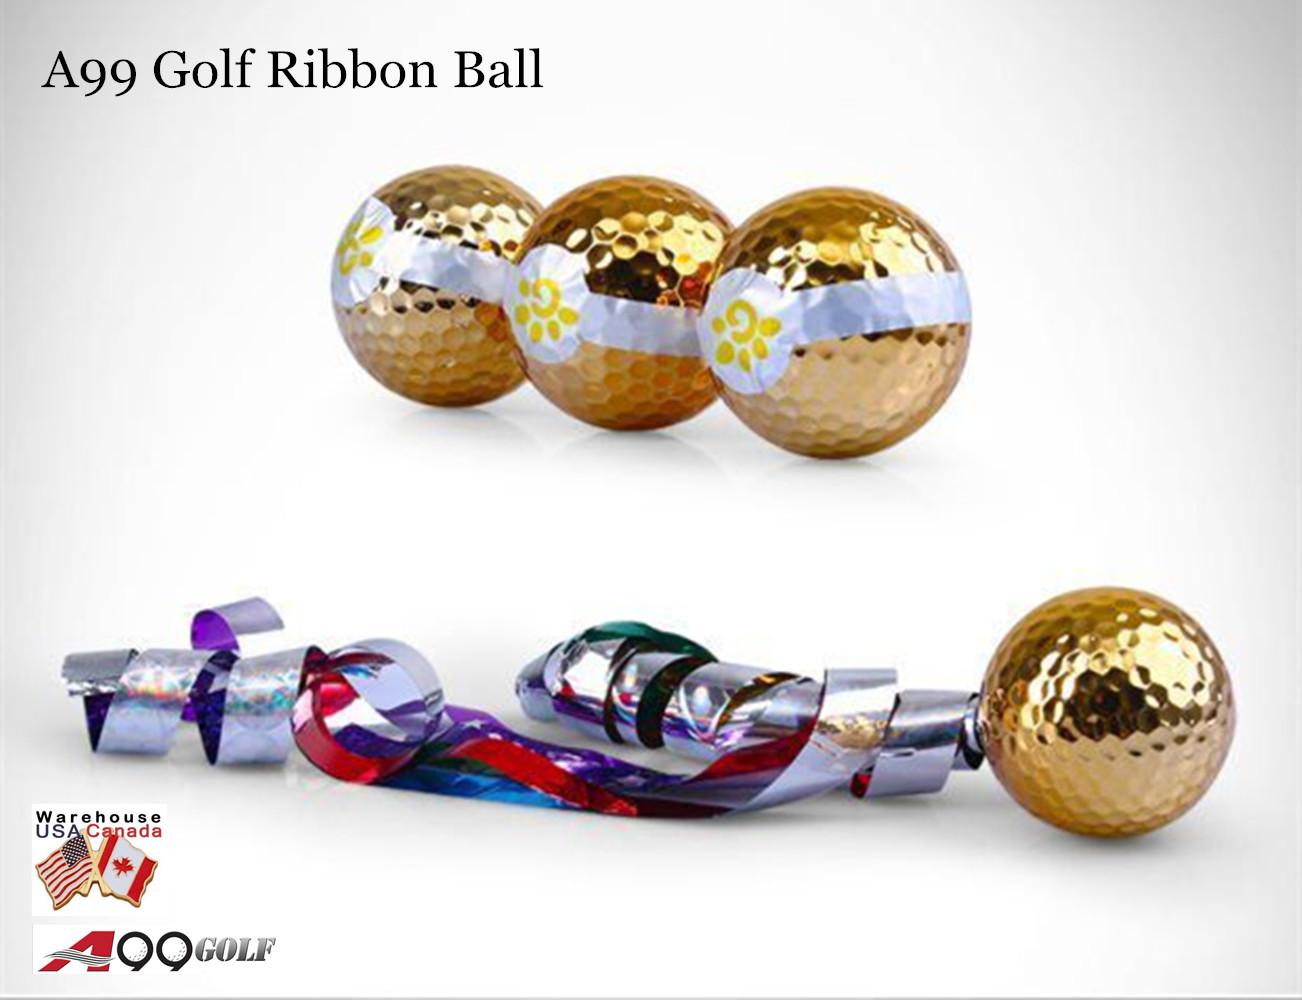 A99-Golf-Ribbon-ball.jpg